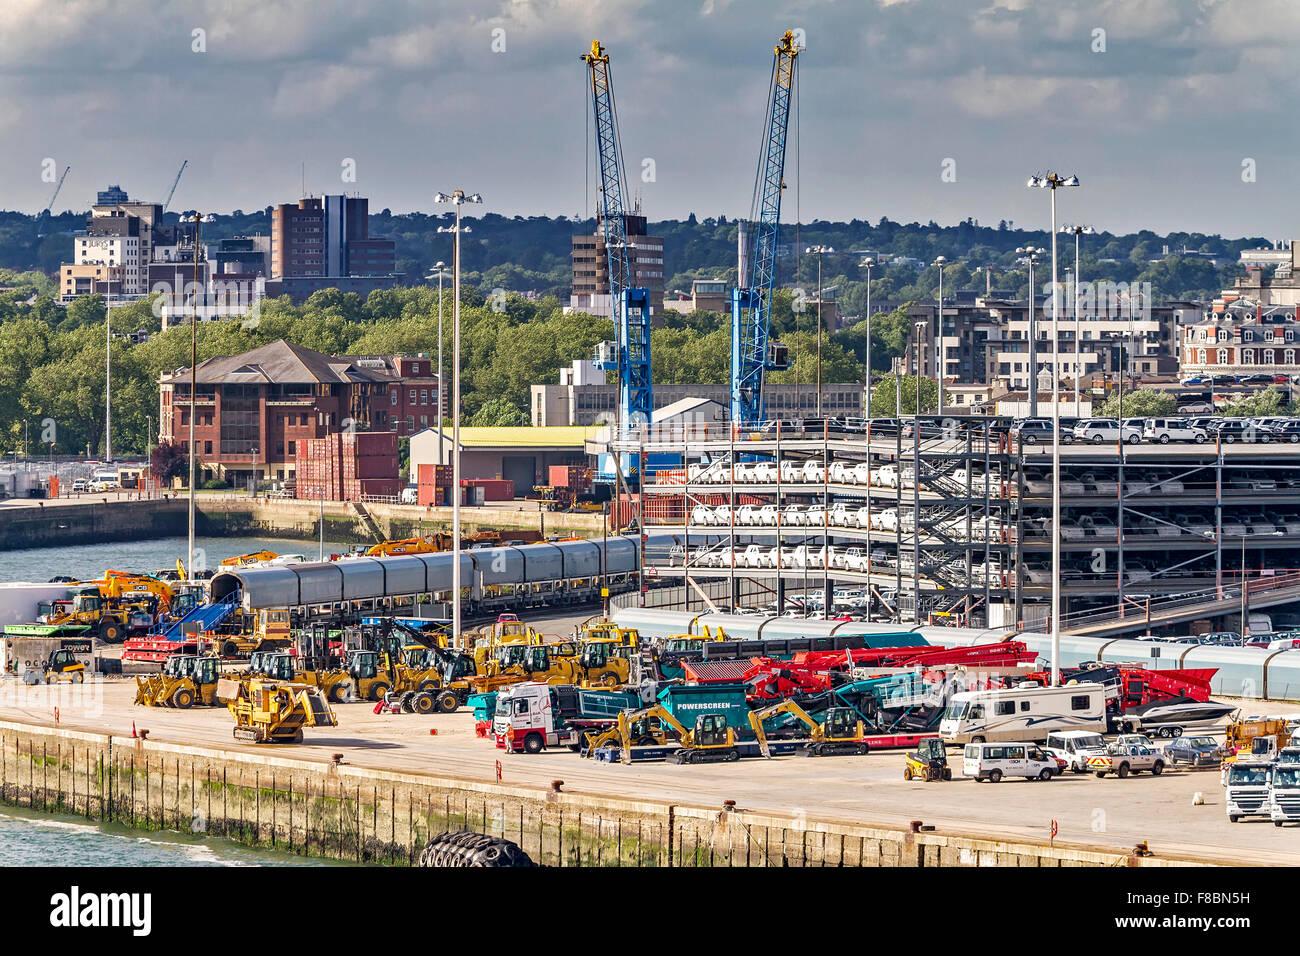 Part Of The Dockyard Southampton UK - Stock Image